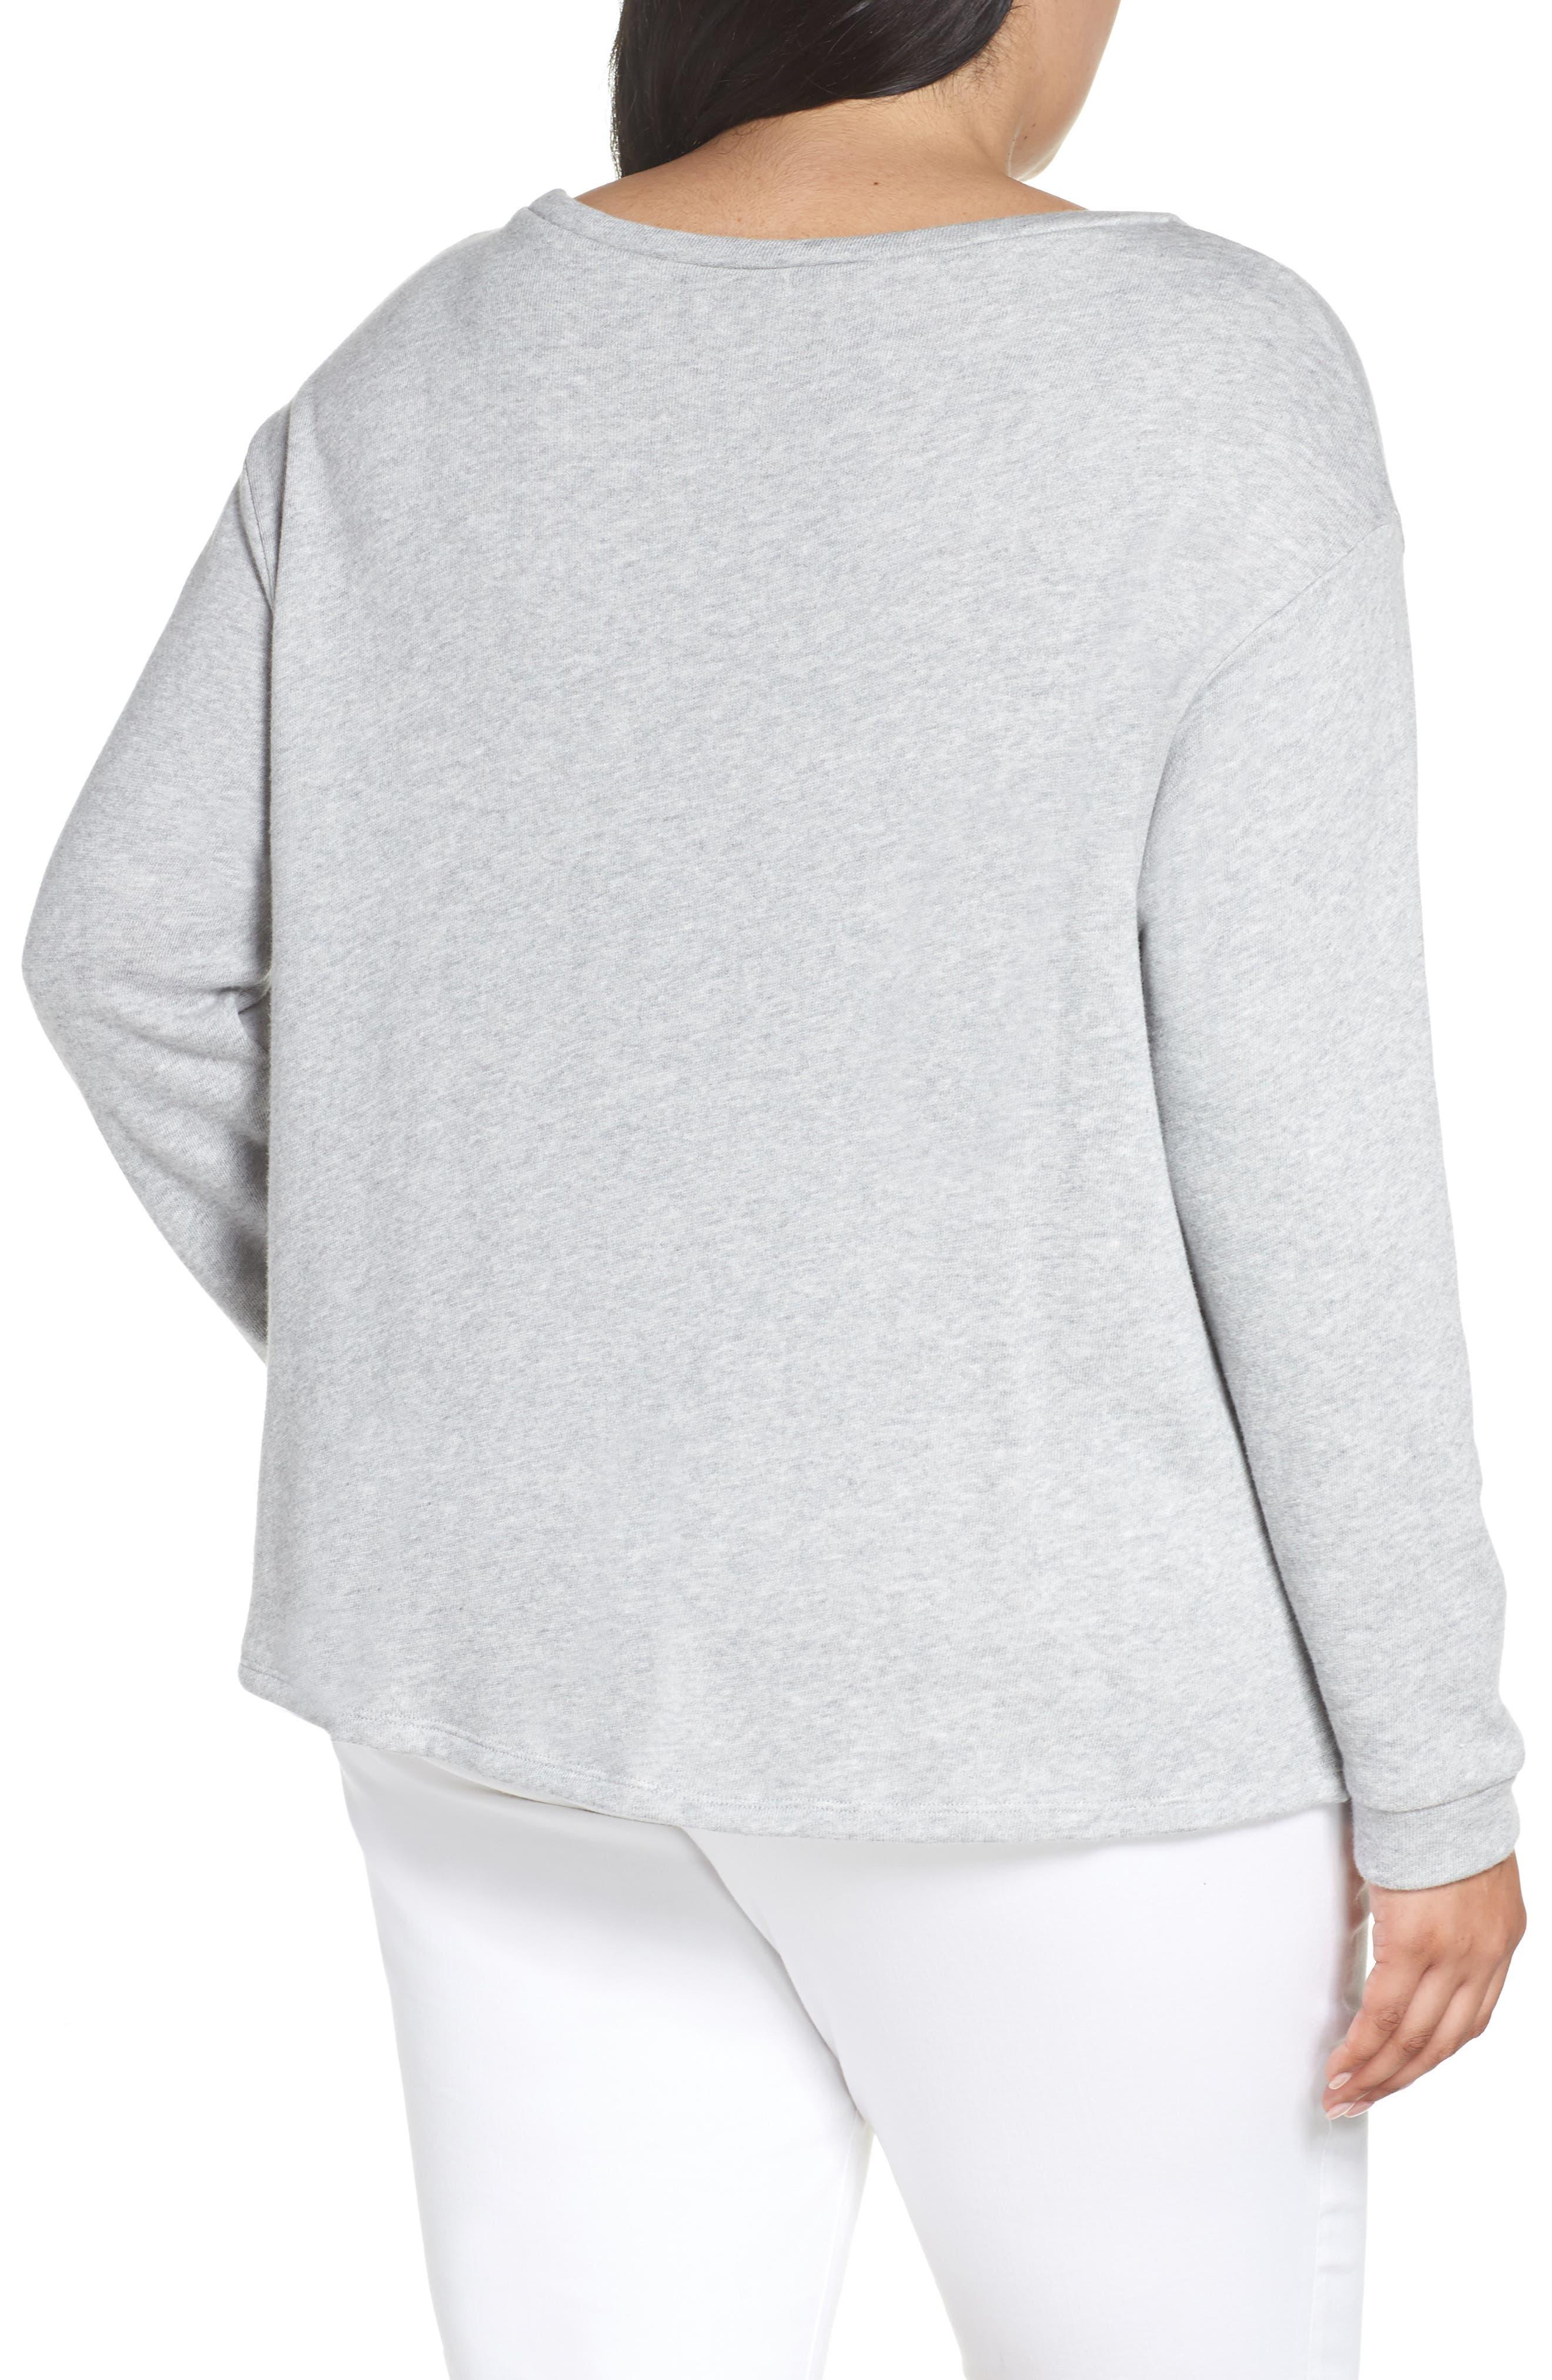 Twist Front Sweatshirt,                             Alternate thumbnail 2, color,                             GREY HEATHER